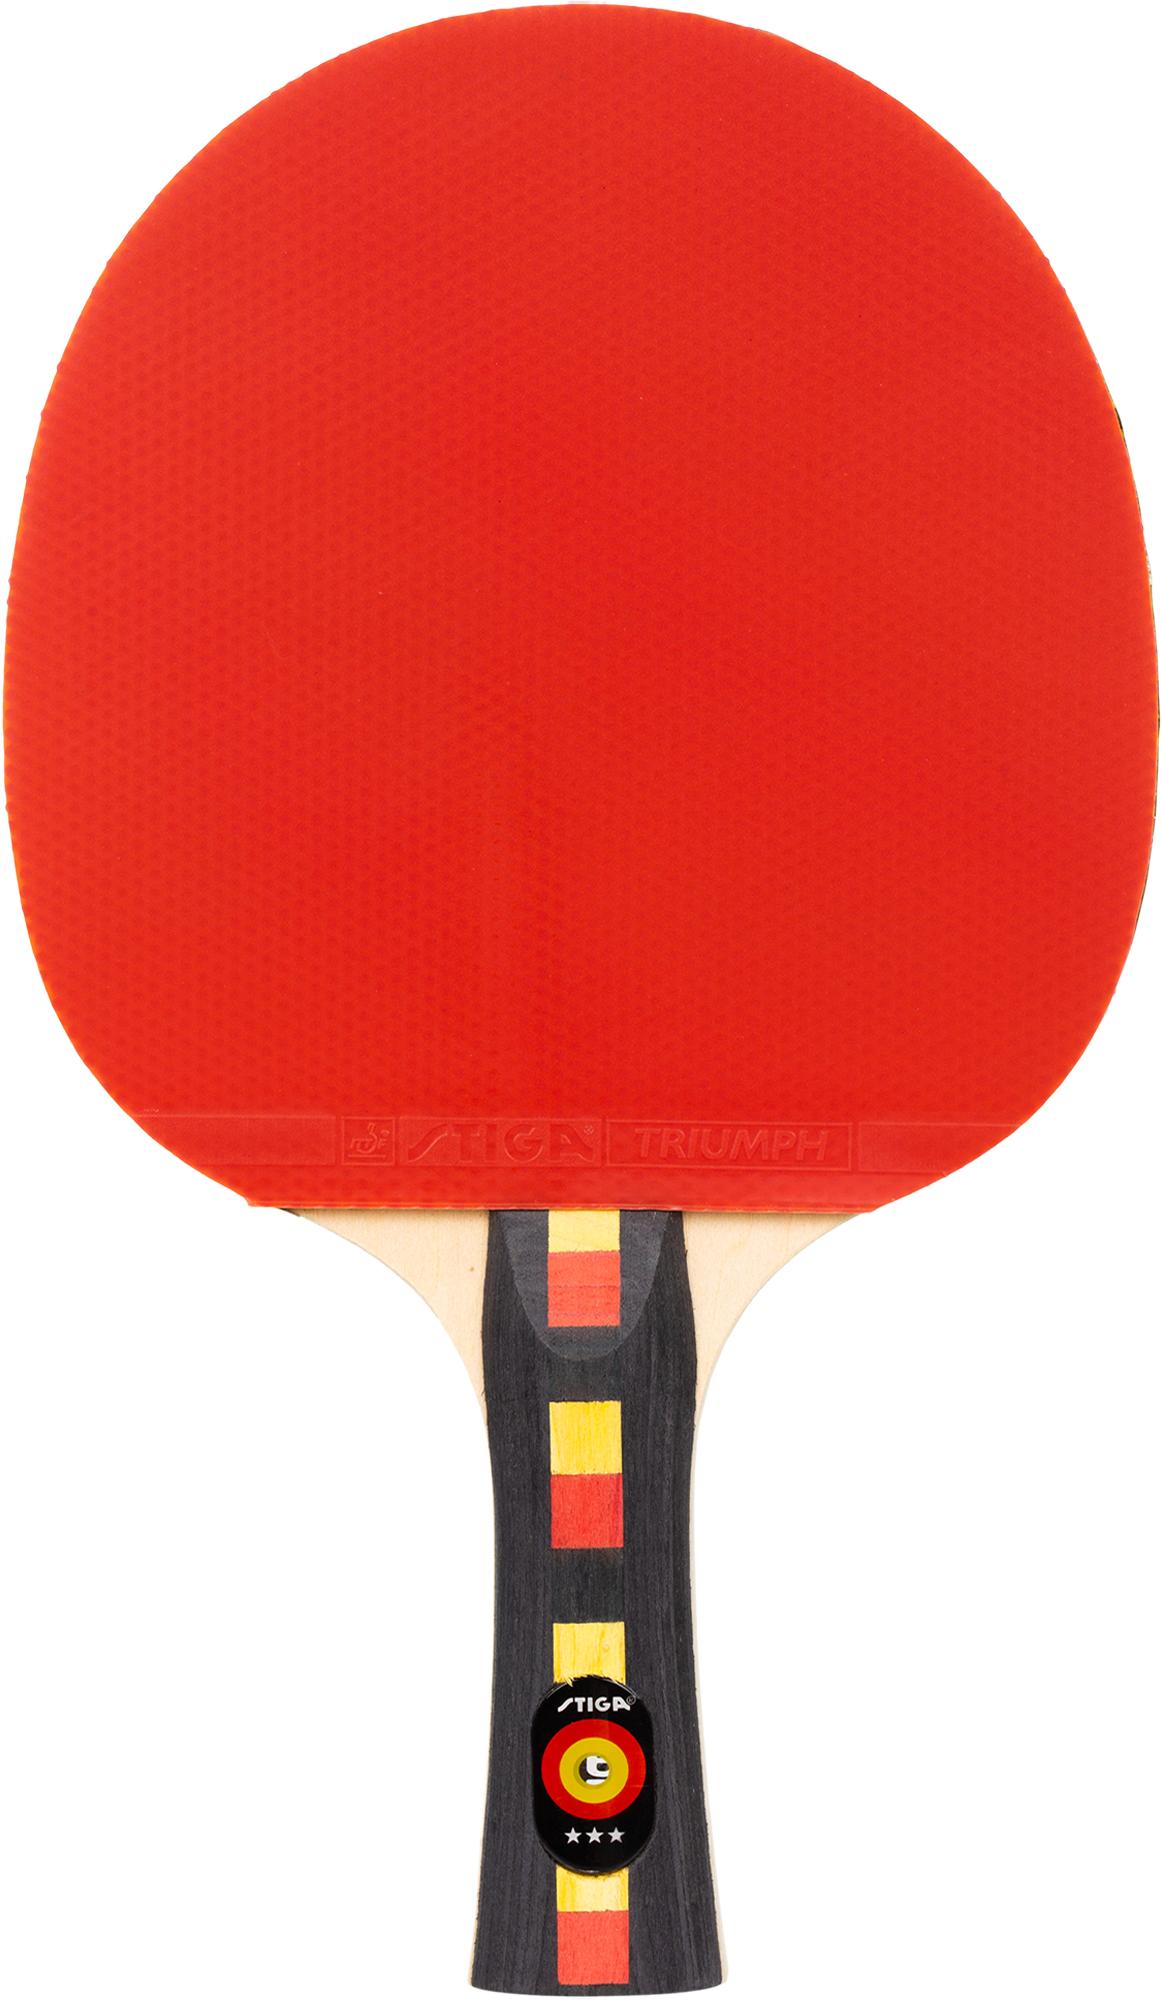 Stiga Ракетка для настольного тенниса Circle Aggressive